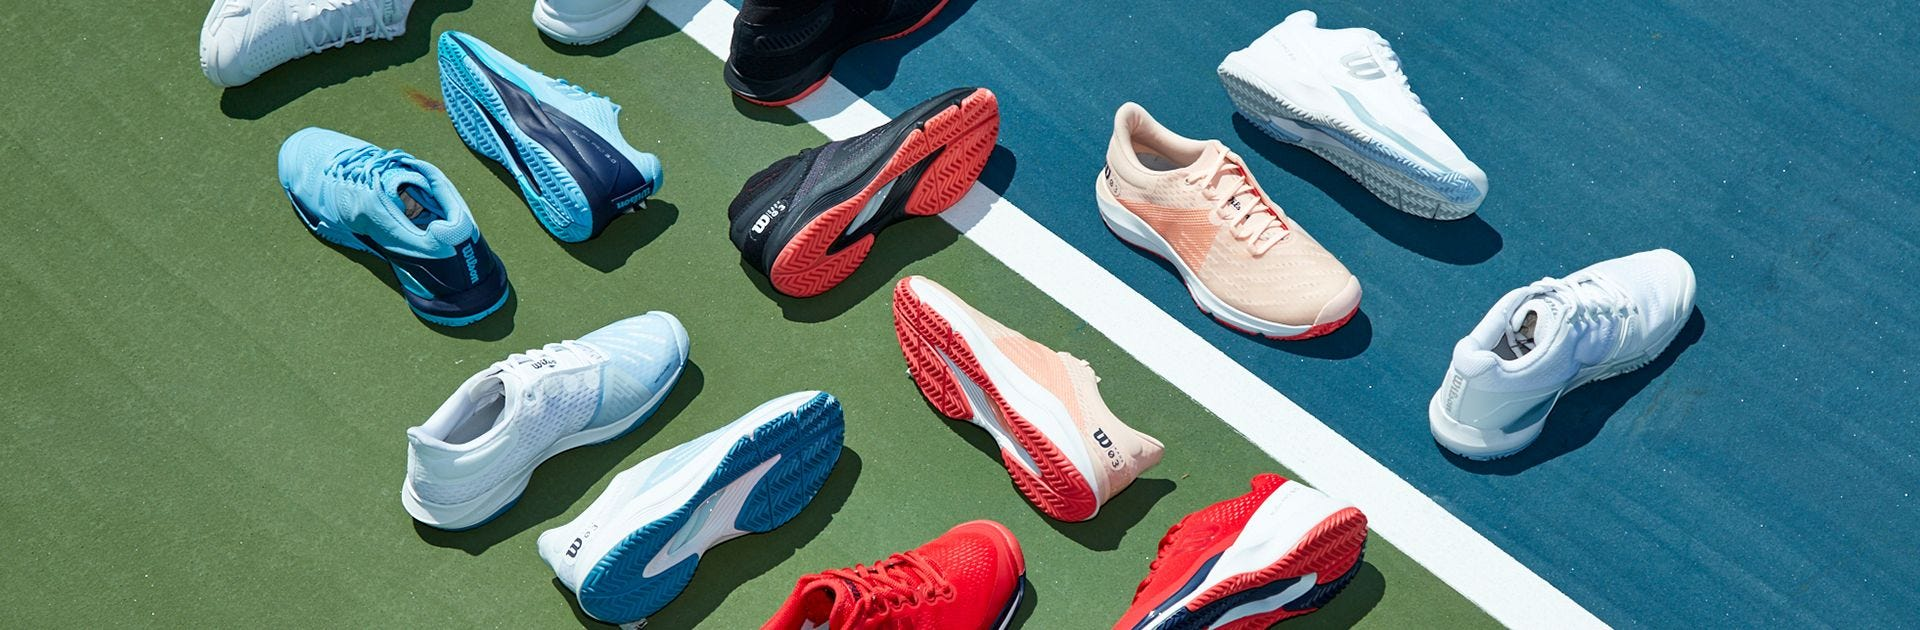 Tennis Shoes | Wilson Sporting Goods